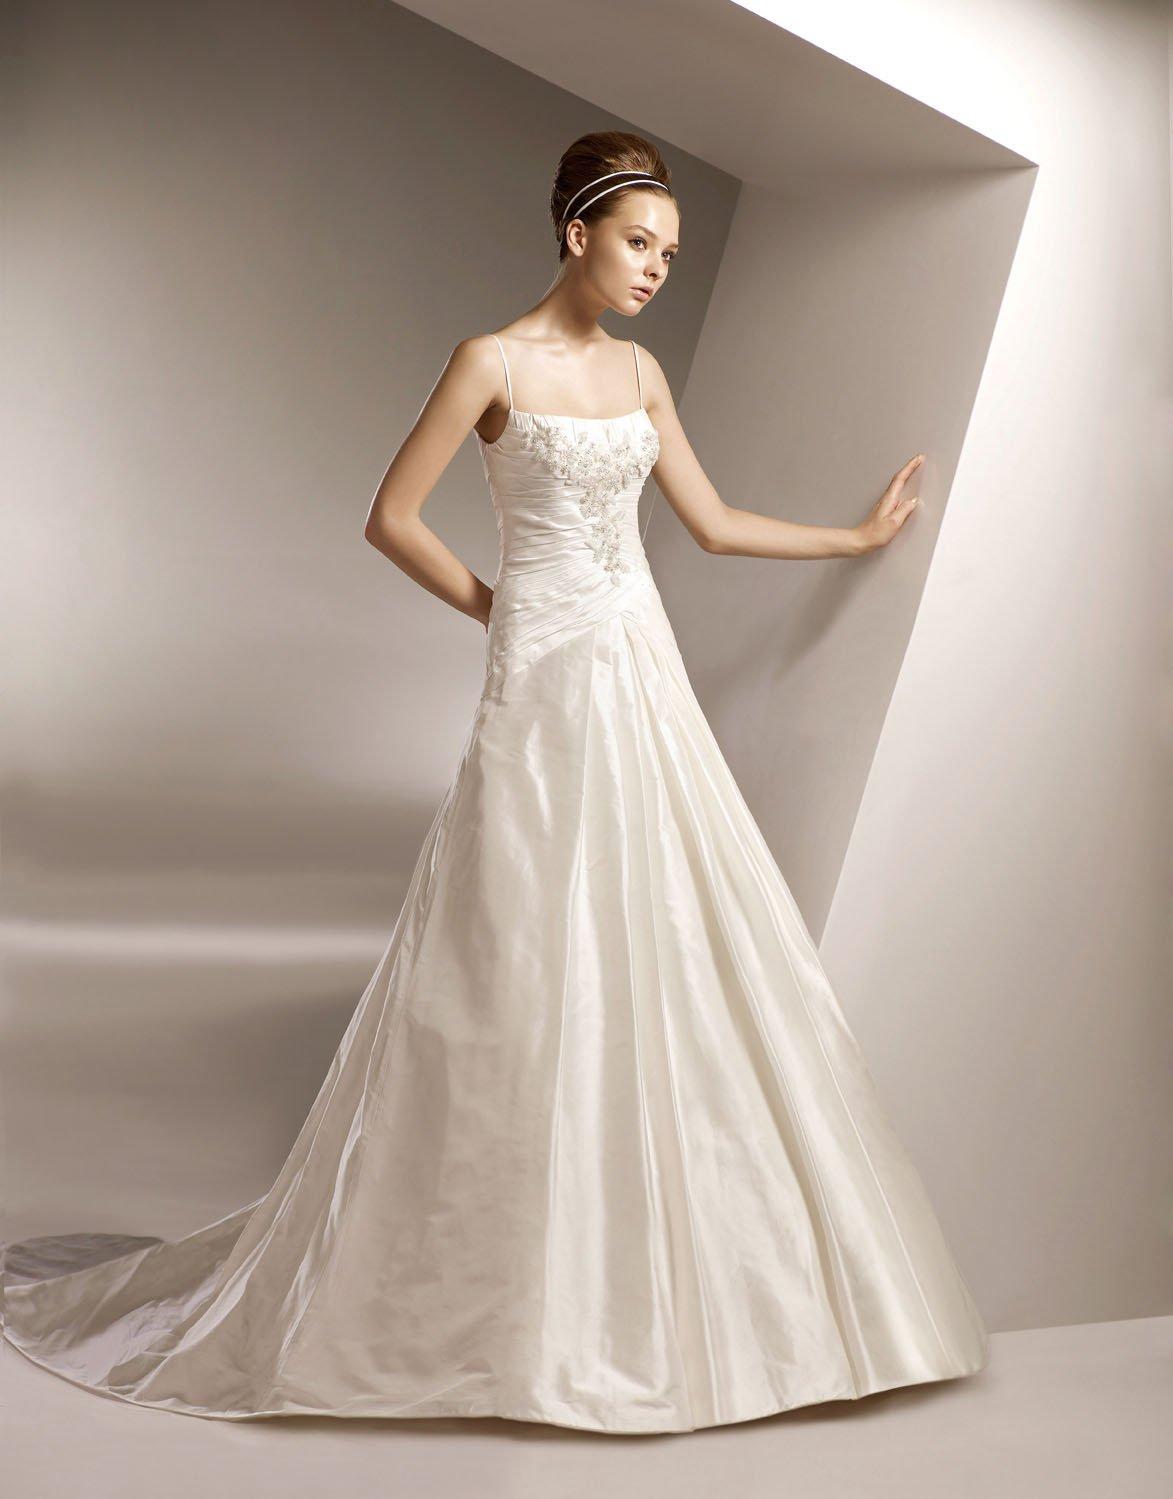 Spaghetti Strap Scoop Appliqued Beaded Taffeta Wedding Dress Bridal Gown